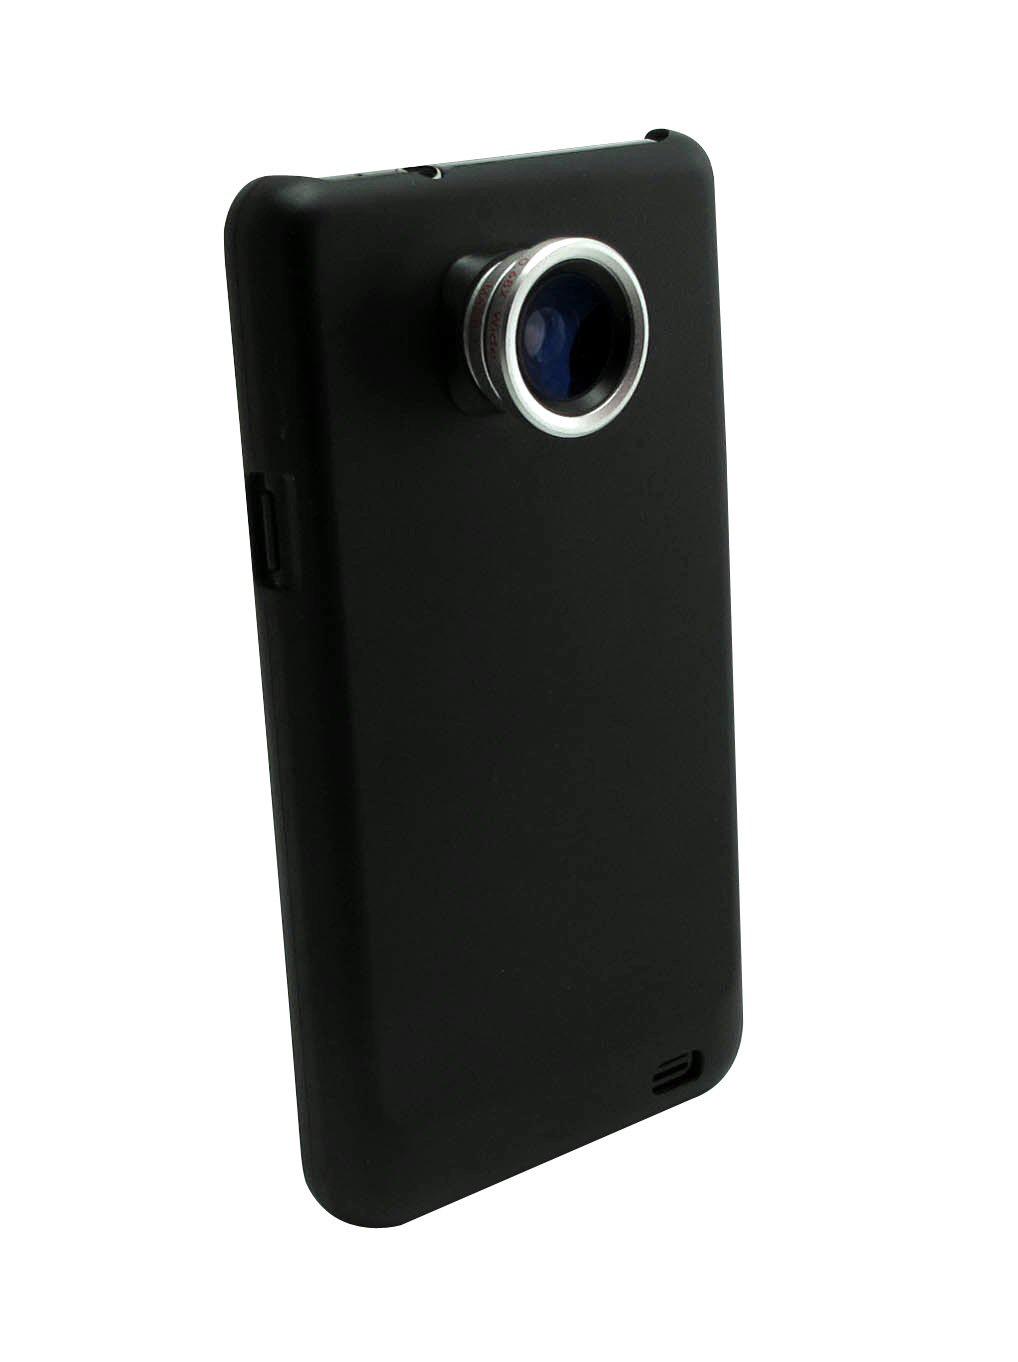 TANLA Wide Angle/Macro Lens for Samsung Galaxy S2